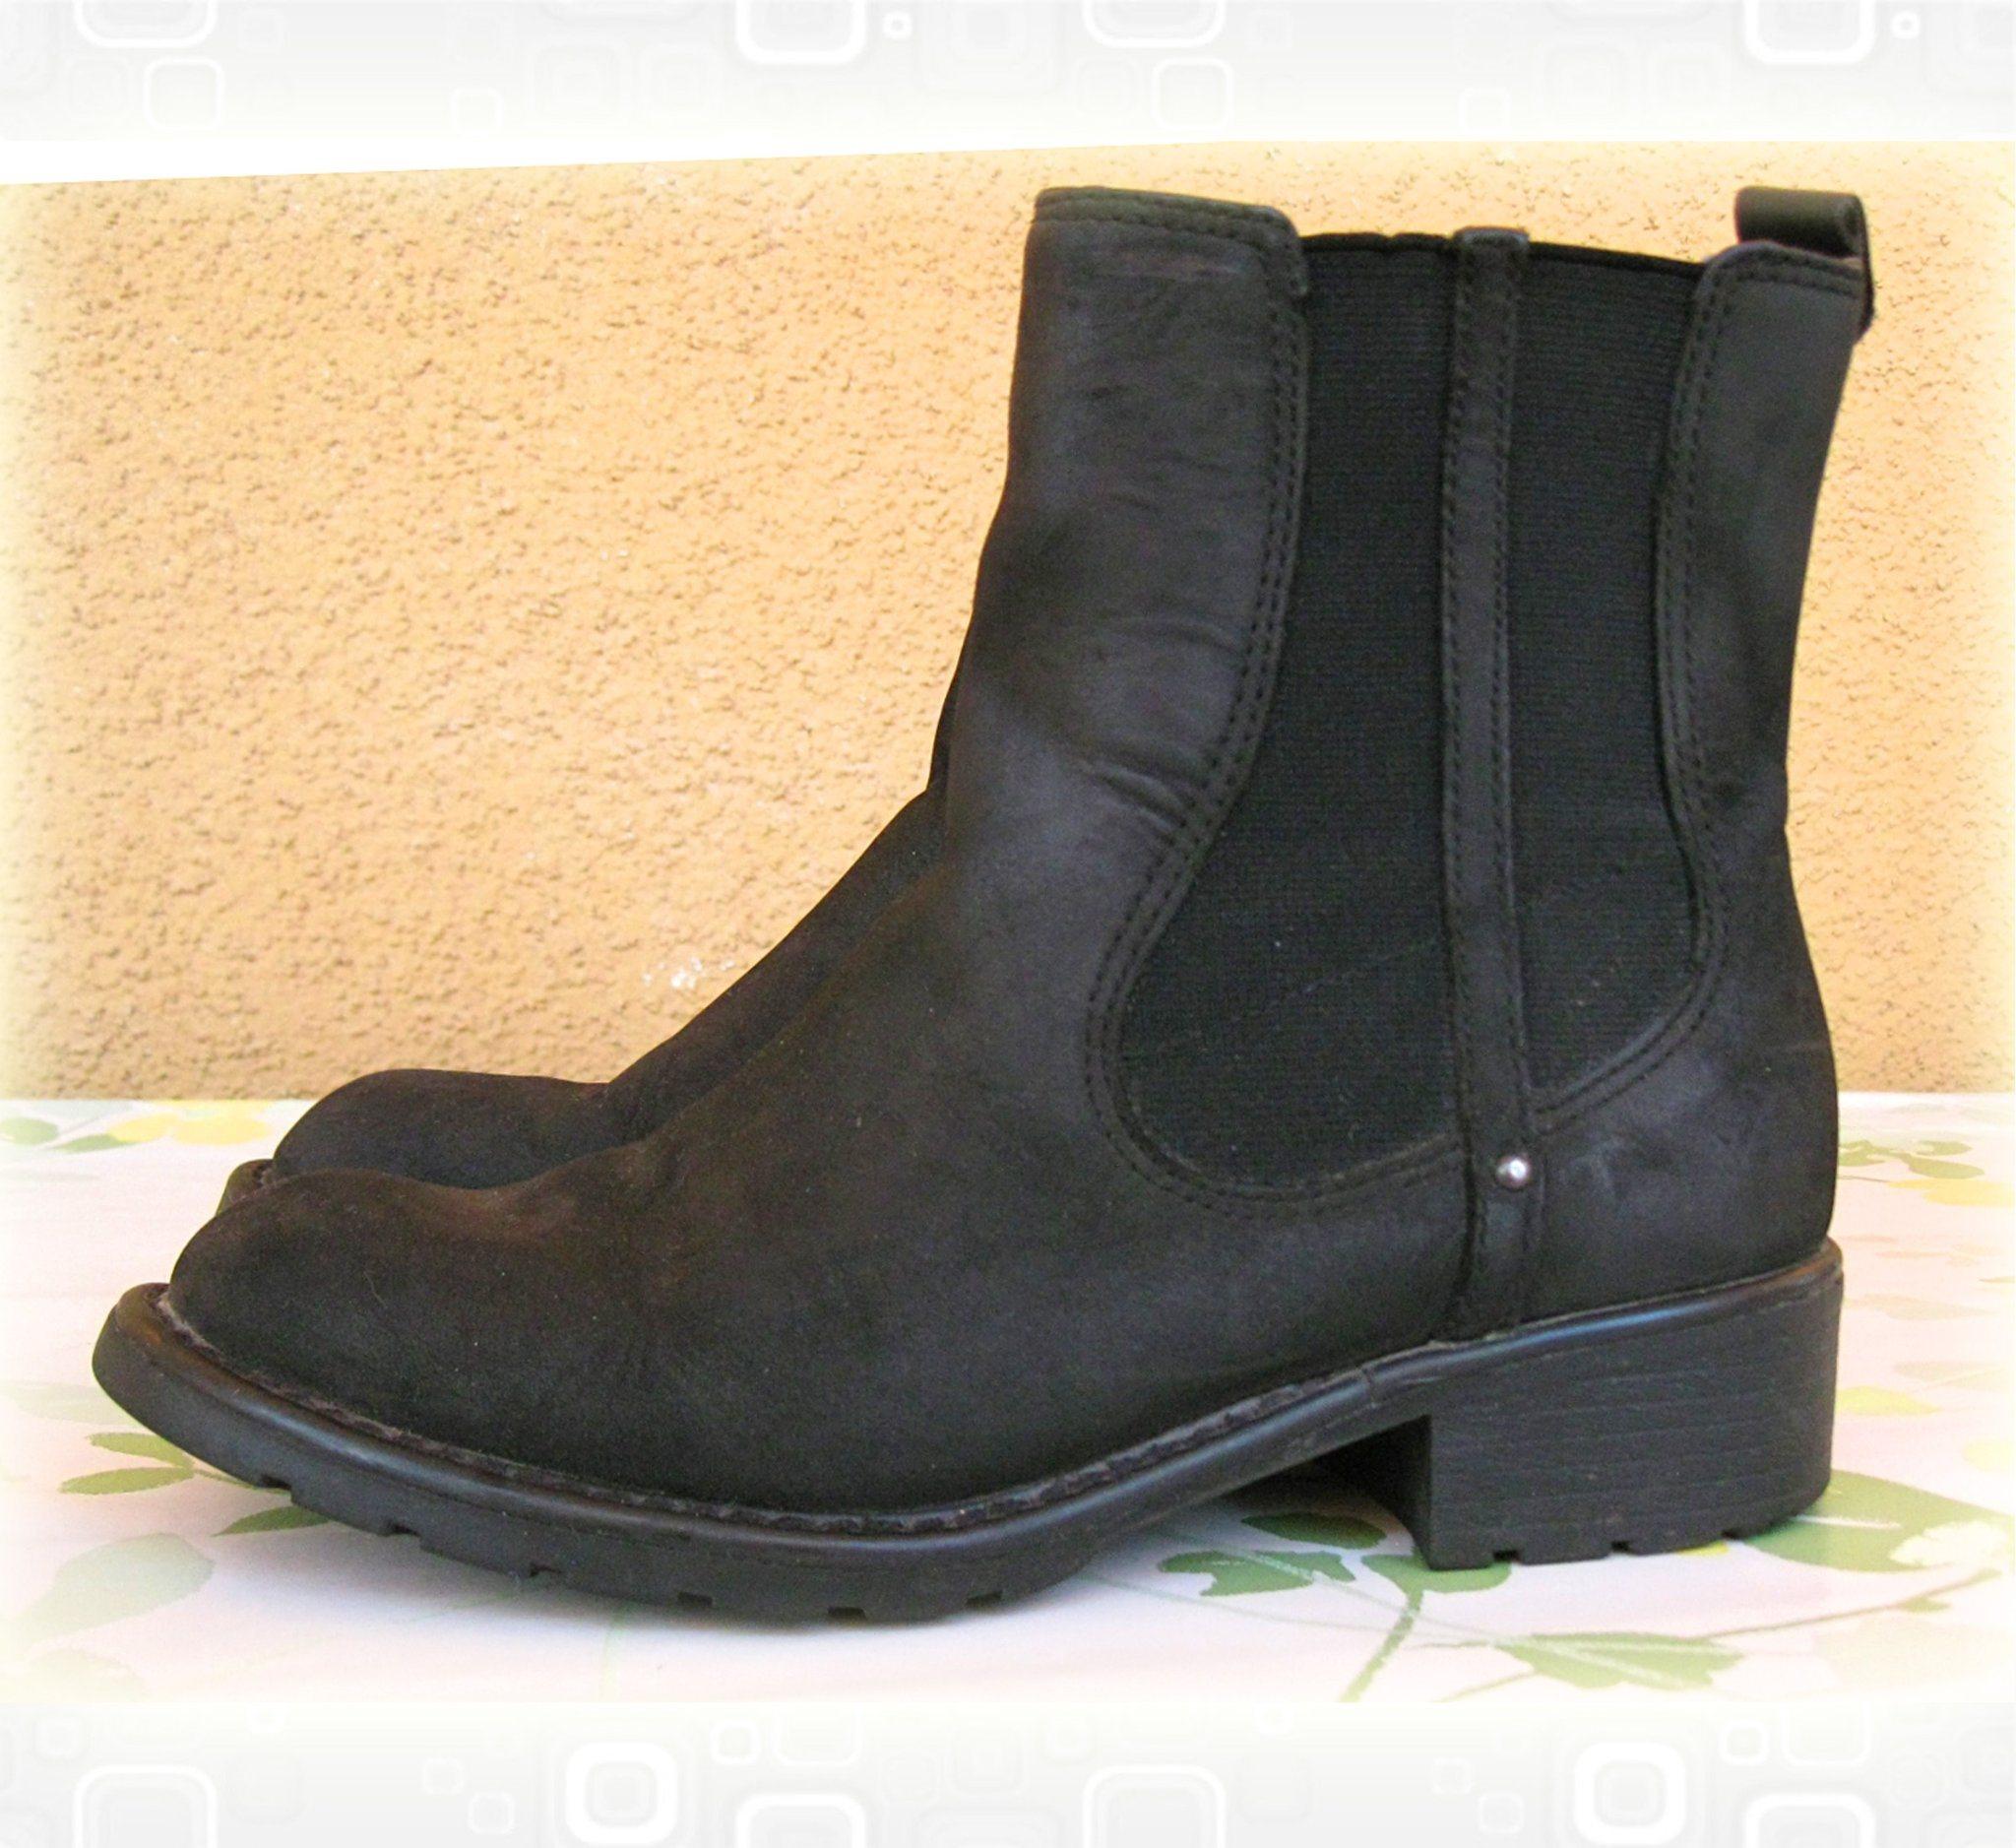 5dd7295184f Clarks SKINNSKOR/Jodphurs/boots/Orinoco/kängor/skinn/nubuck/vårskor ...